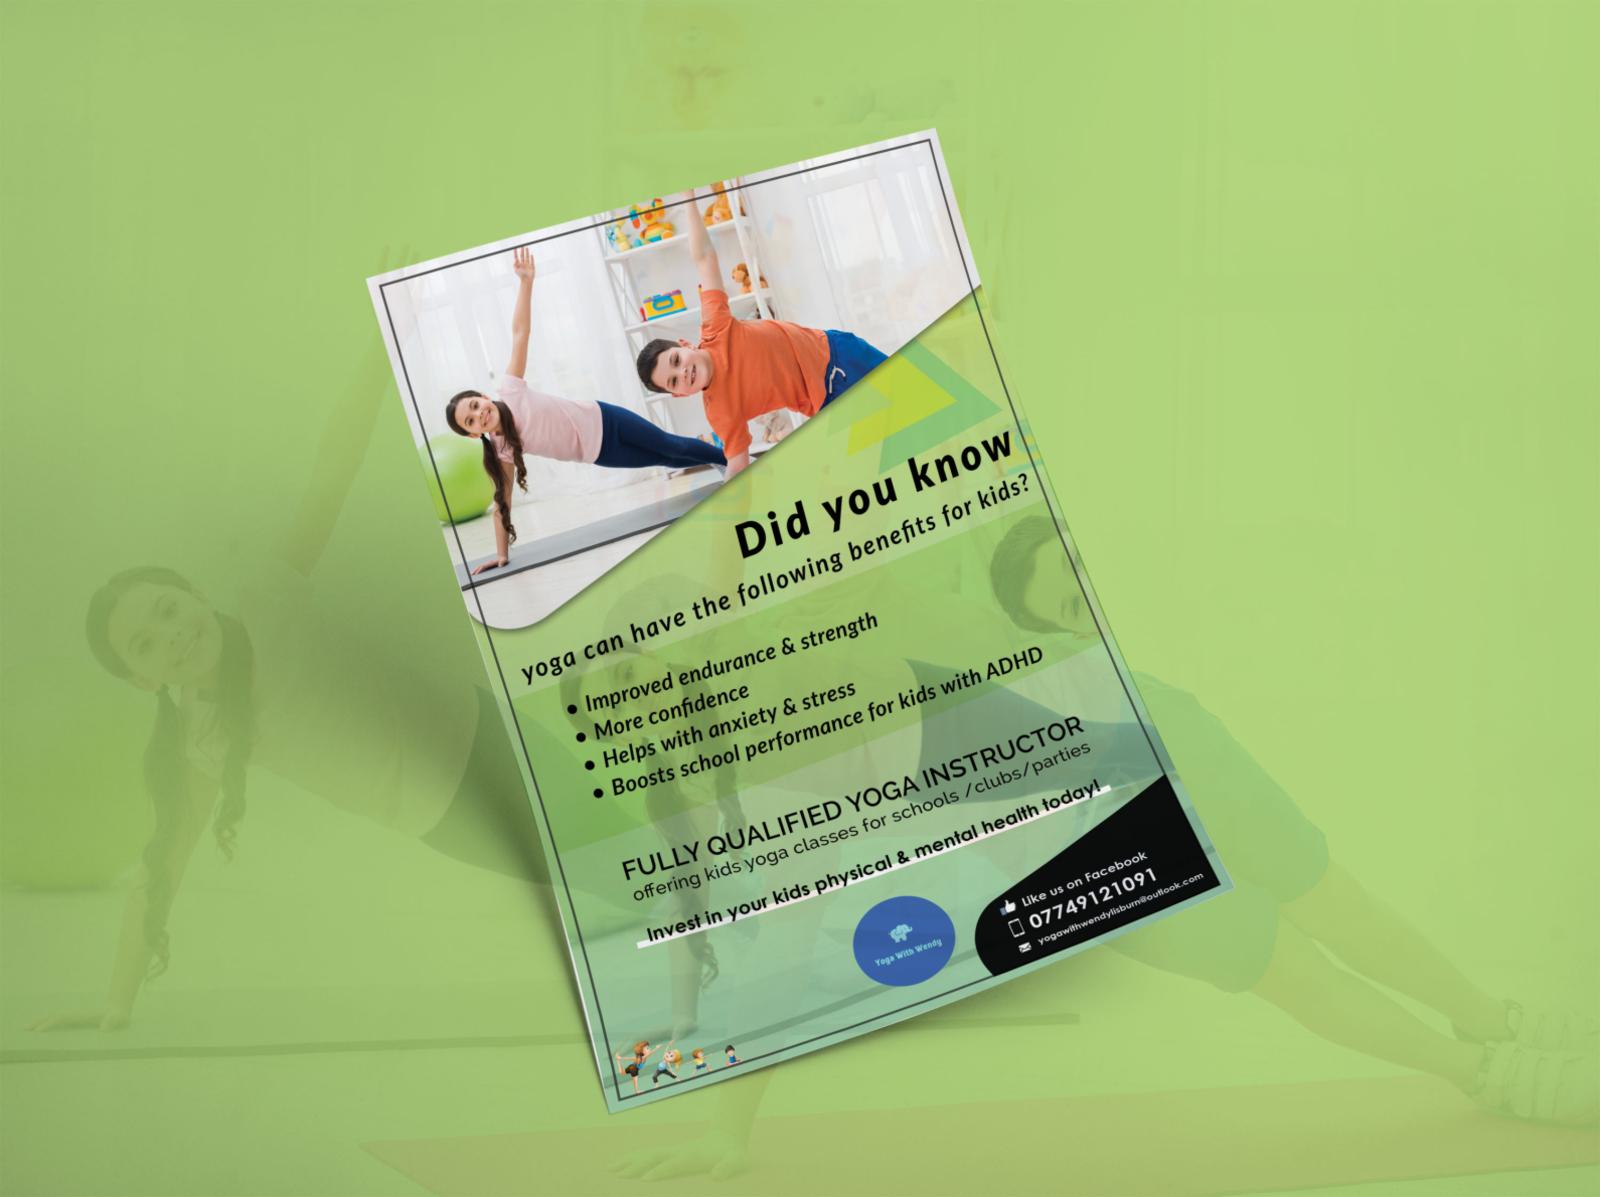 Poster Design Yoga Academy By Asmi Tank On Dribbble